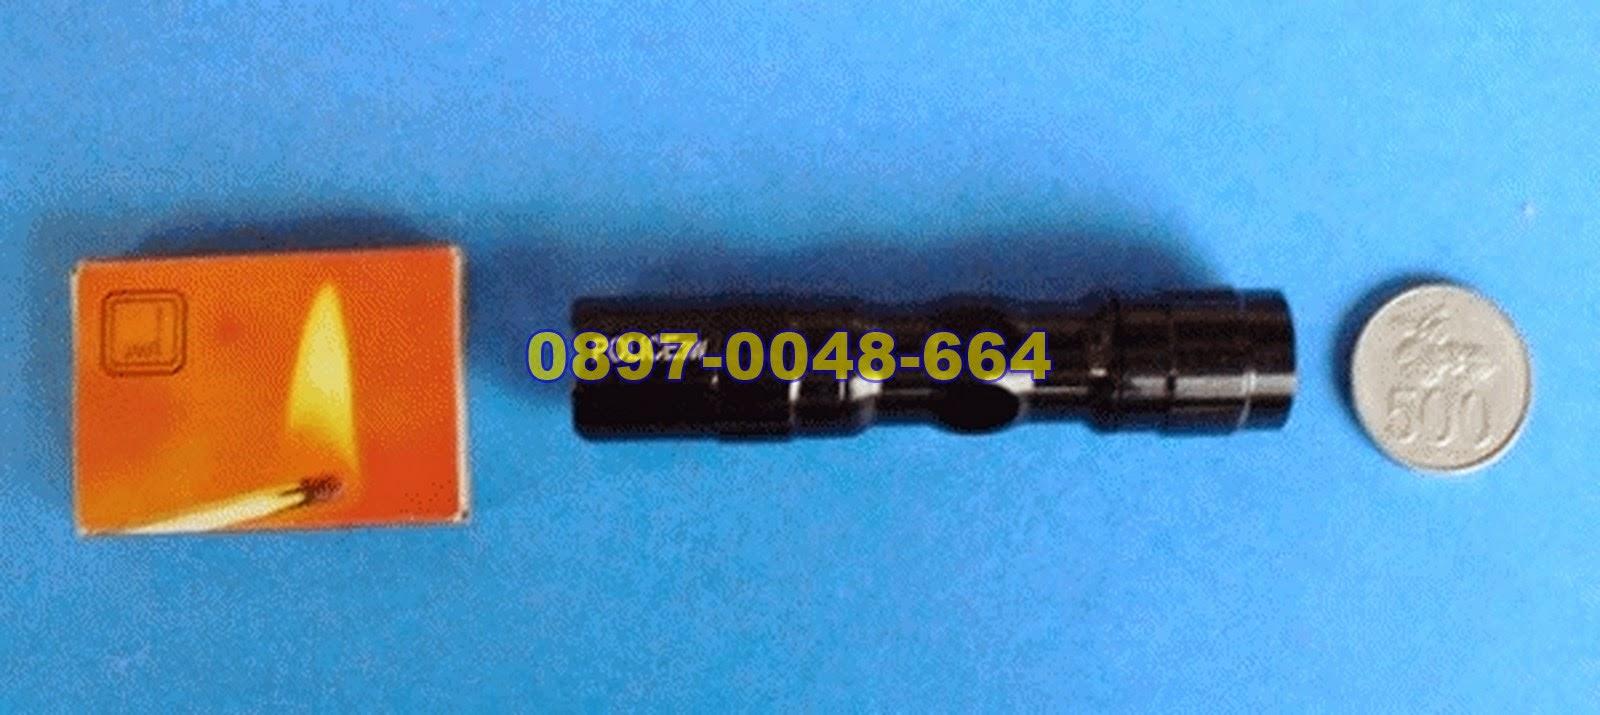 Senter Police 3w Mini Led Flashlight Spec Dan Daftar Harga Terbaru Lampu Kecil 9 Sj0020 Lamp